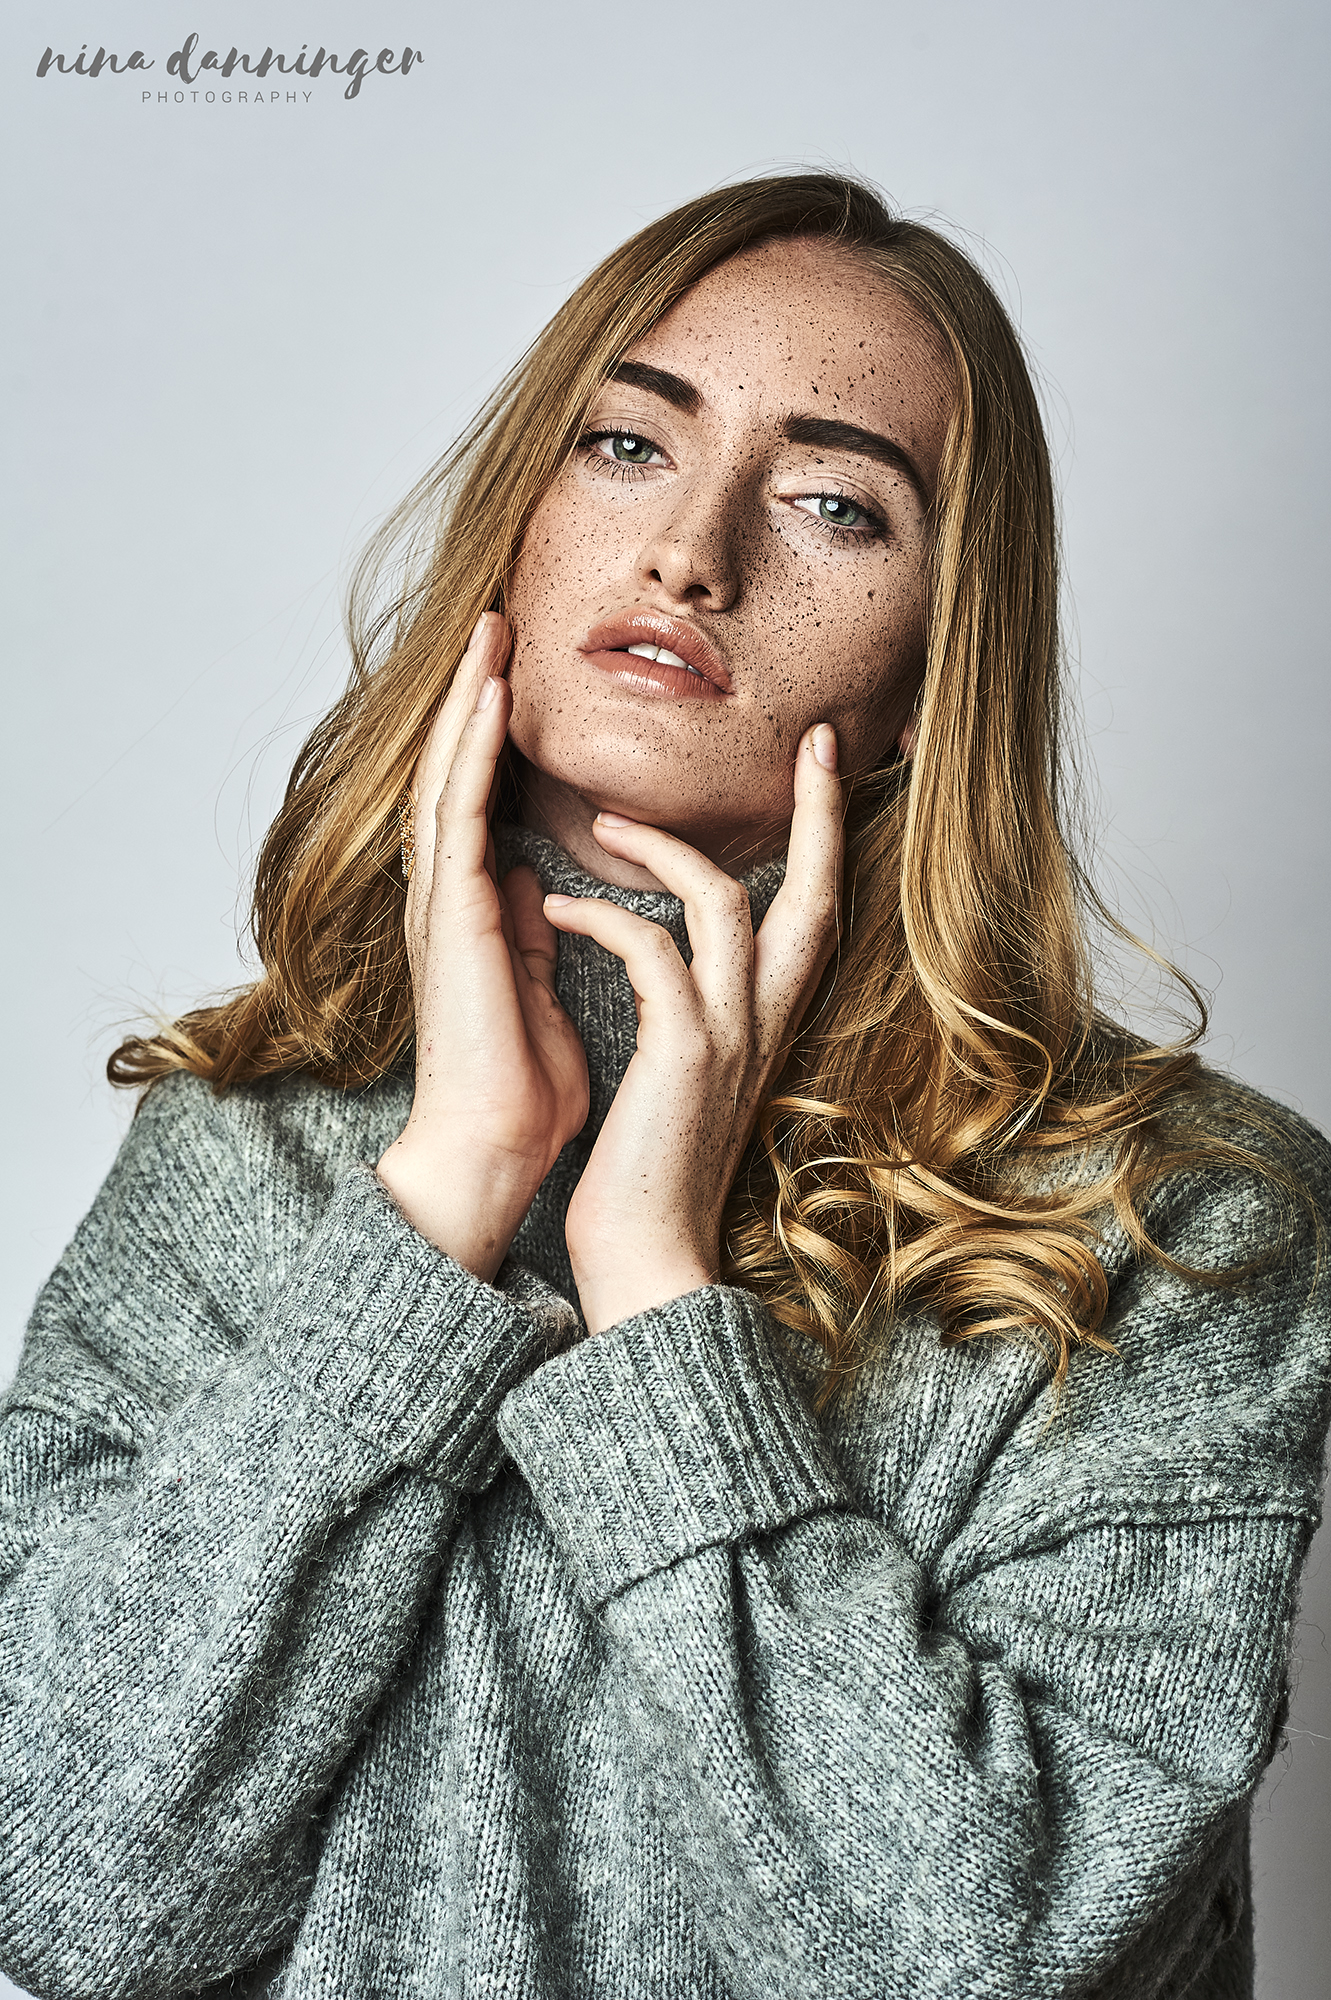 Studio Portrait Fotograf Nina Danninger